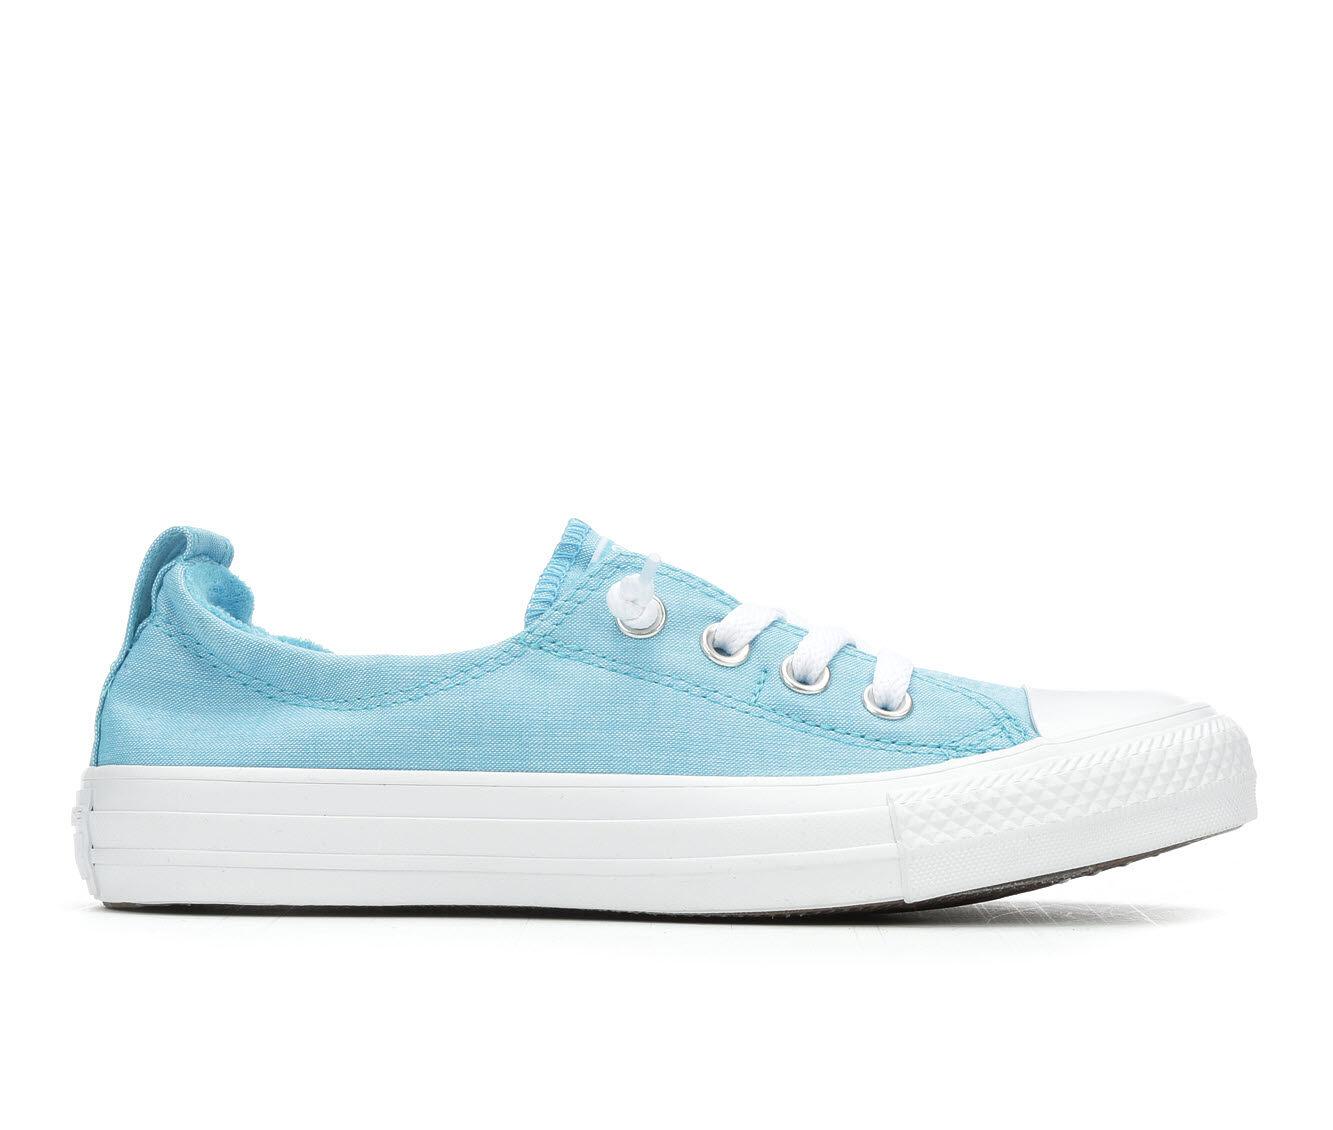 Women's Converse Shoreline Beach Sneakers Blue/White